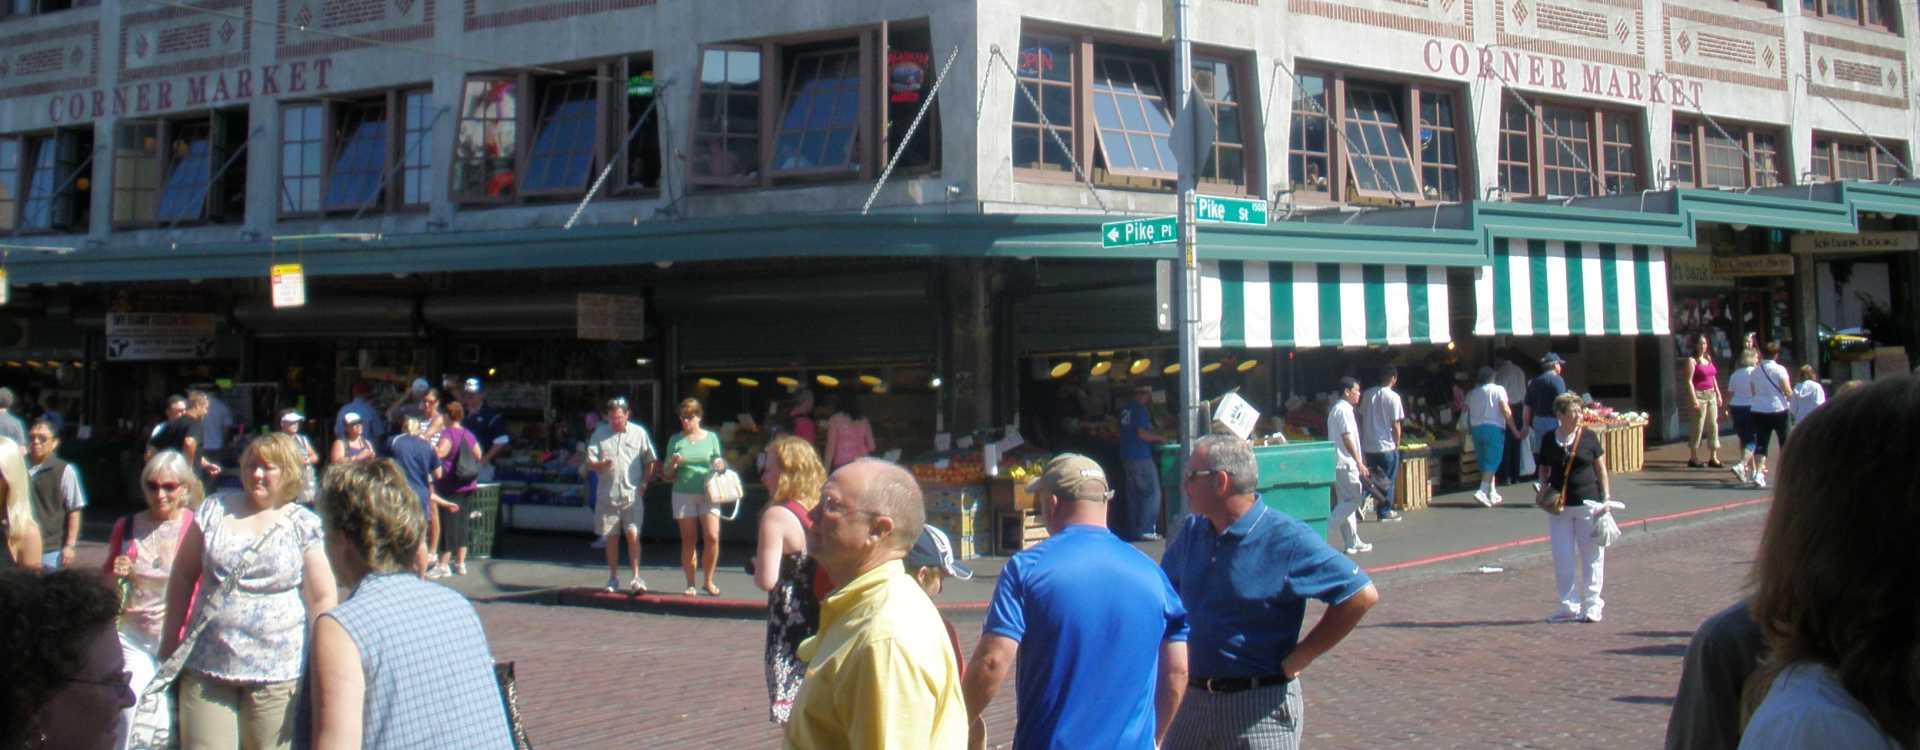 Pike_Place_Market-5.jpg